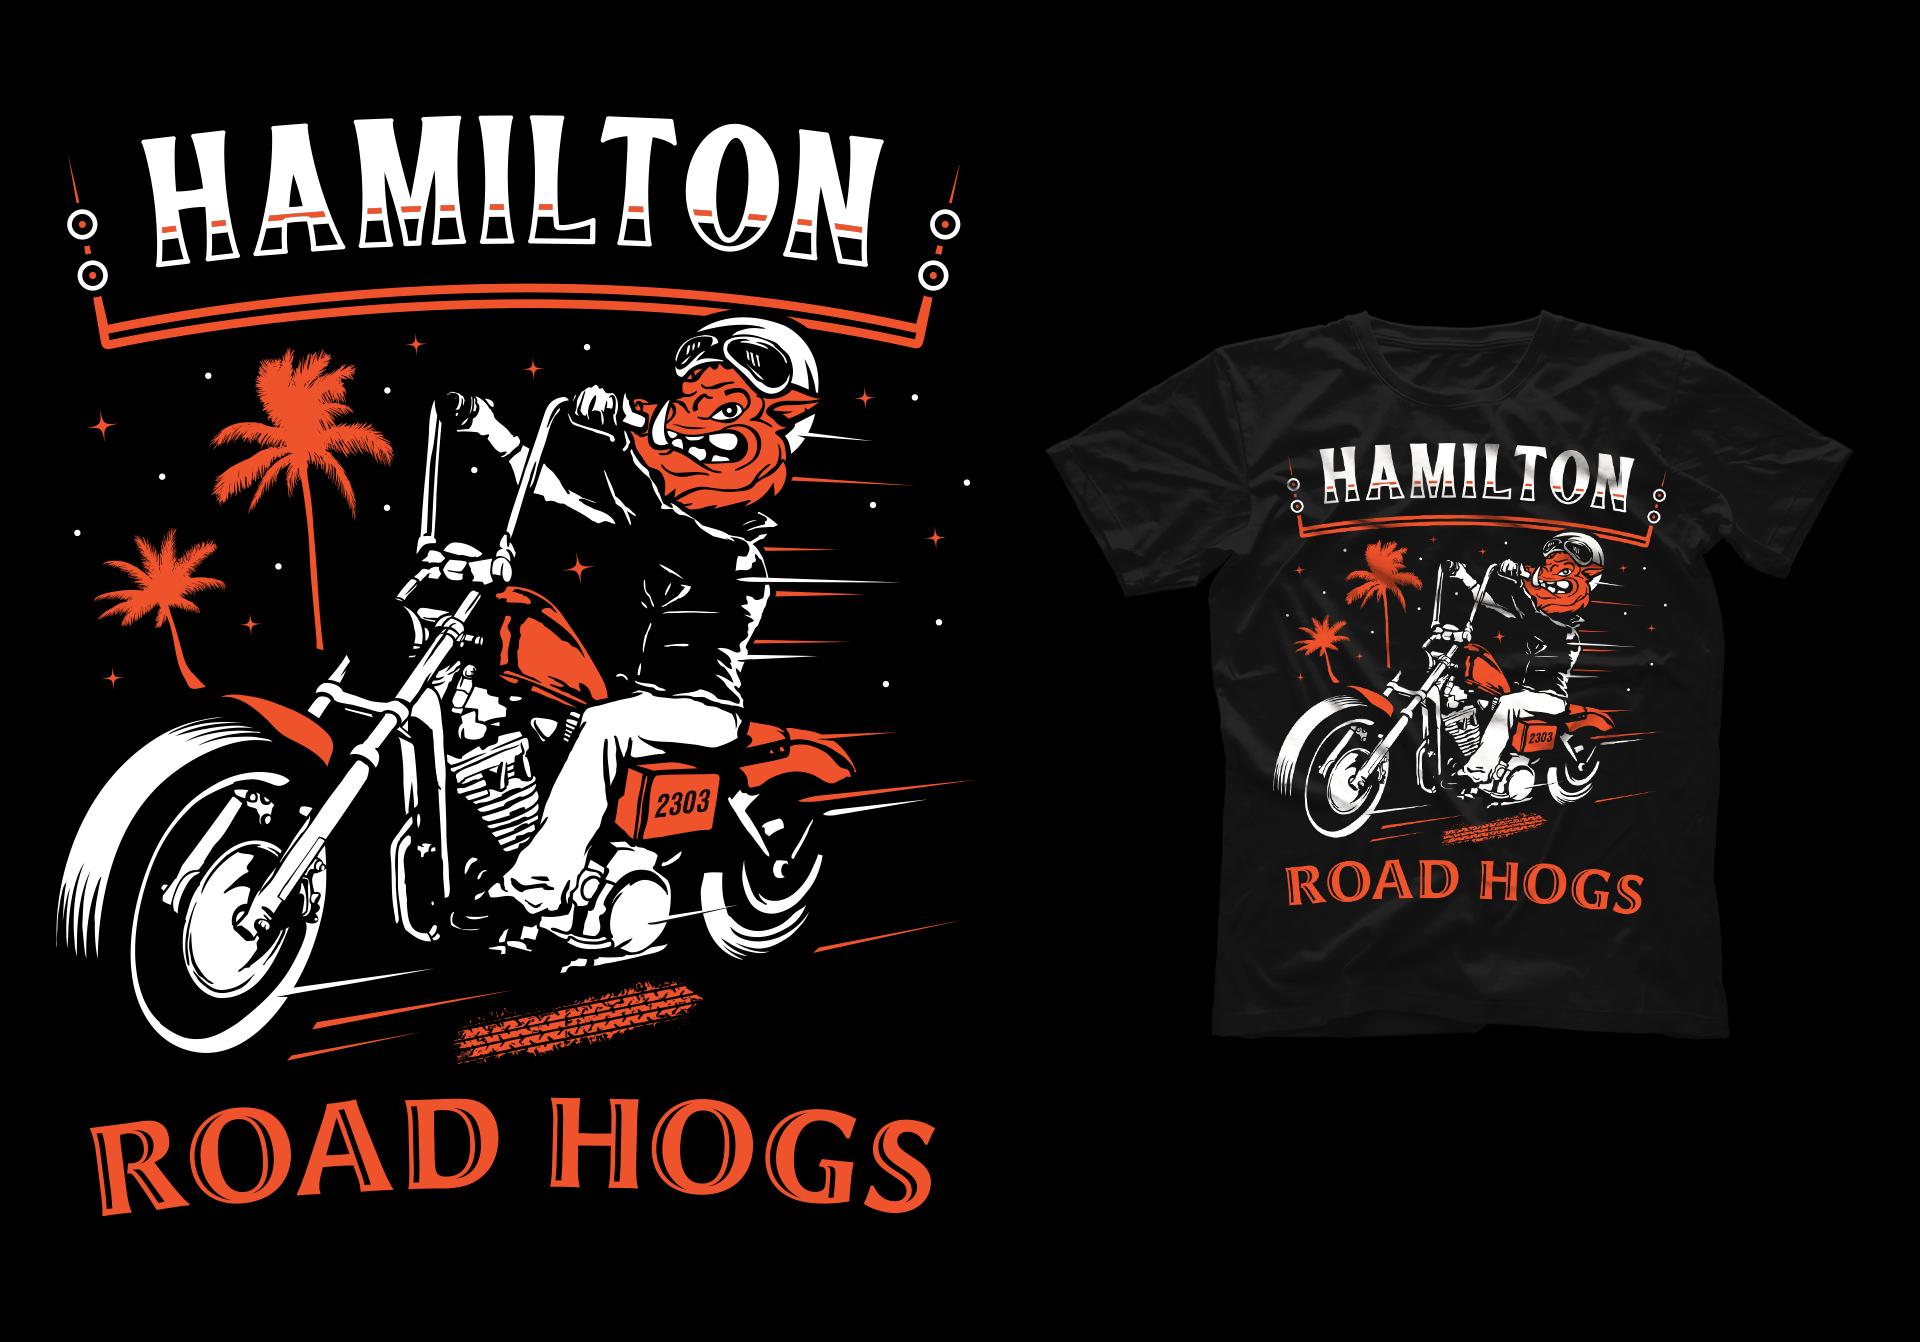 Honey Rogue Design Shirt Artwork Grainfed Brewing Hamilton Road Hogs